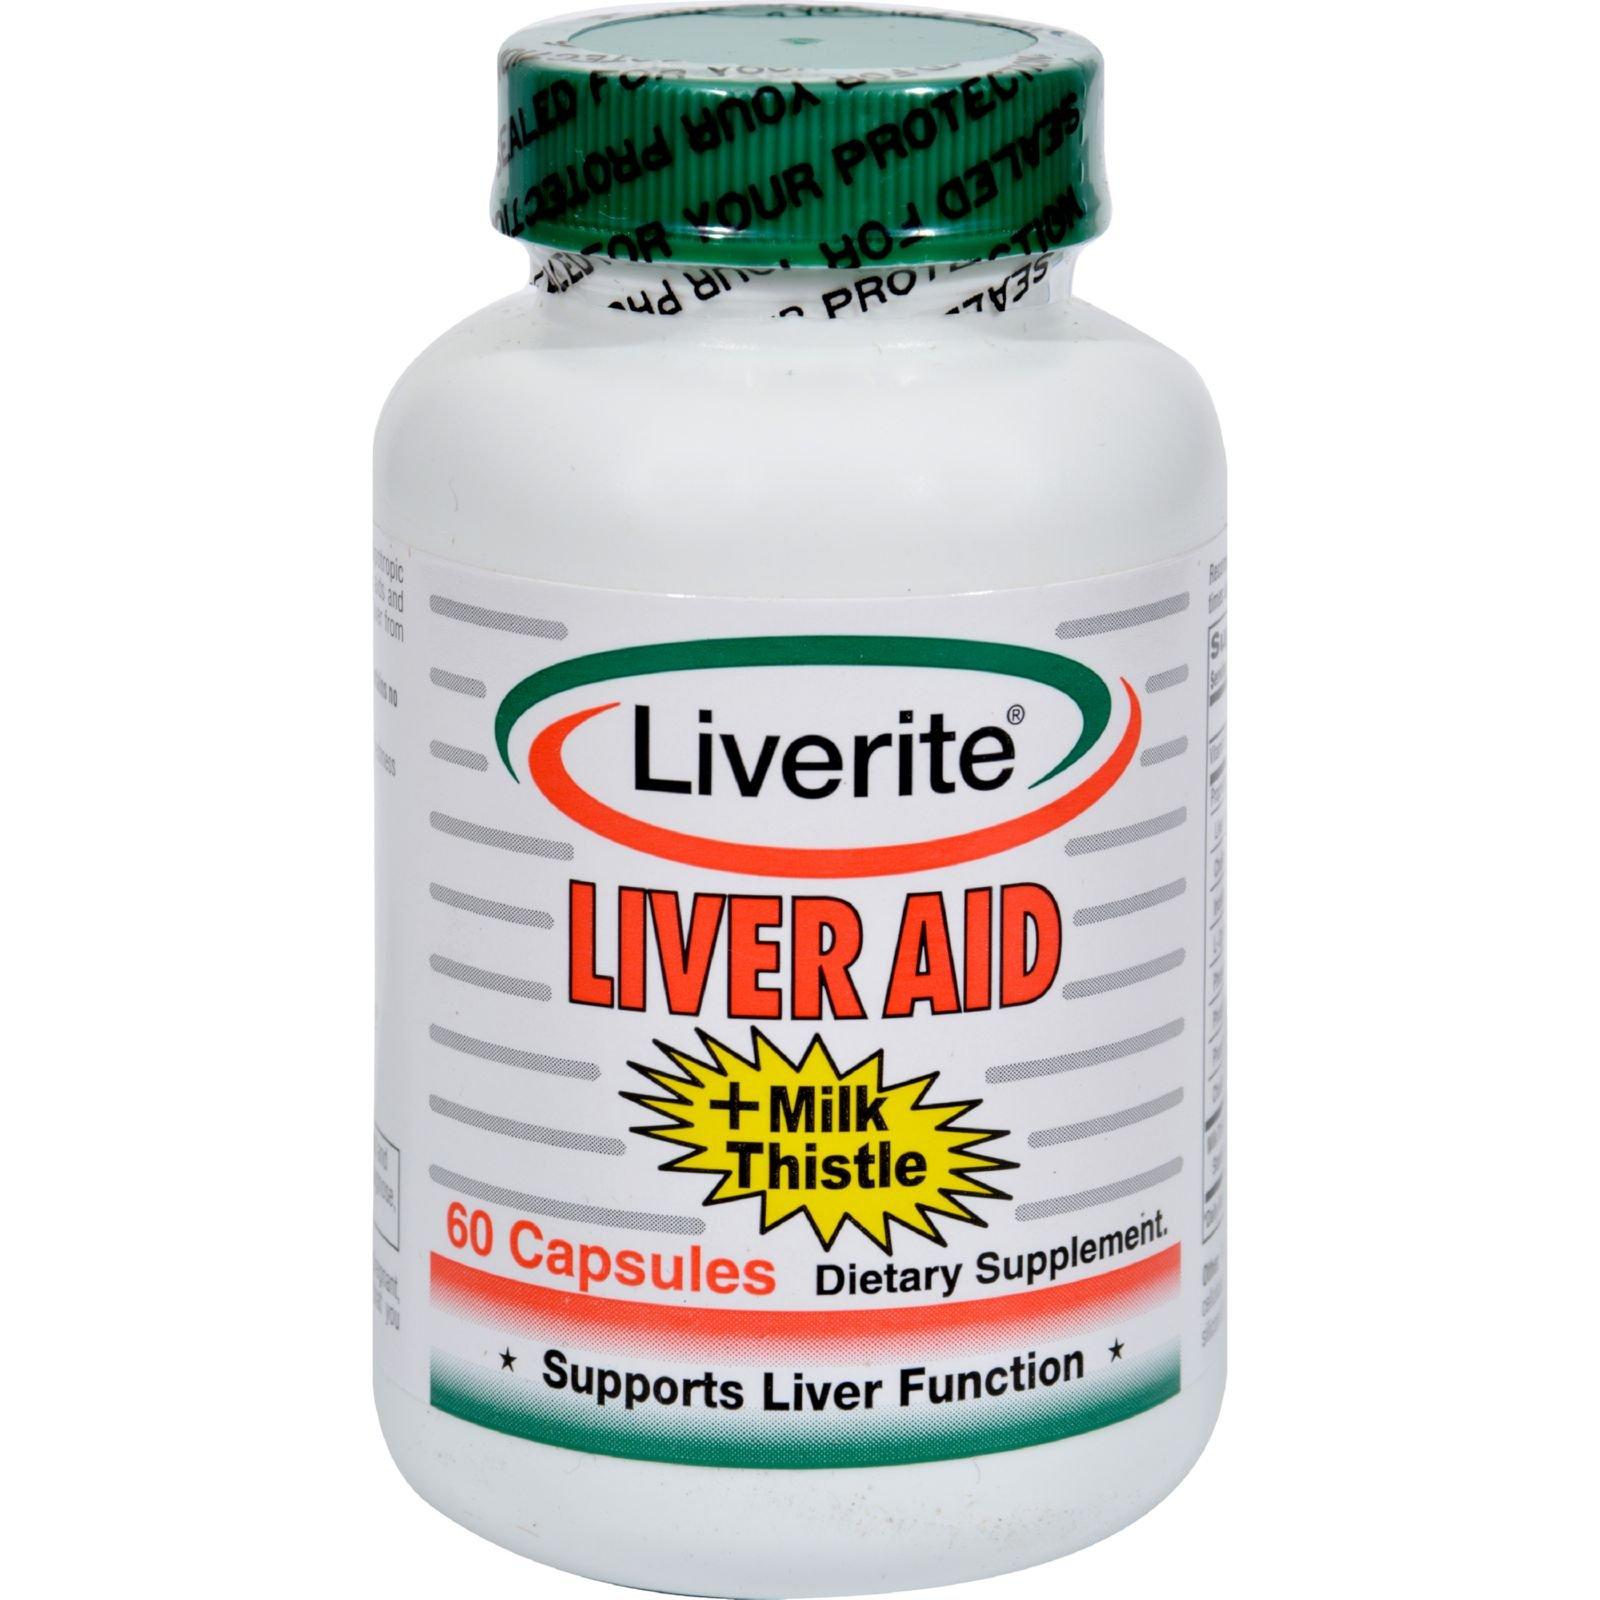 Liverite Liveraid Plus Milk Thistle - Supports Liver Function - 60 Capsules (Pack of 2)